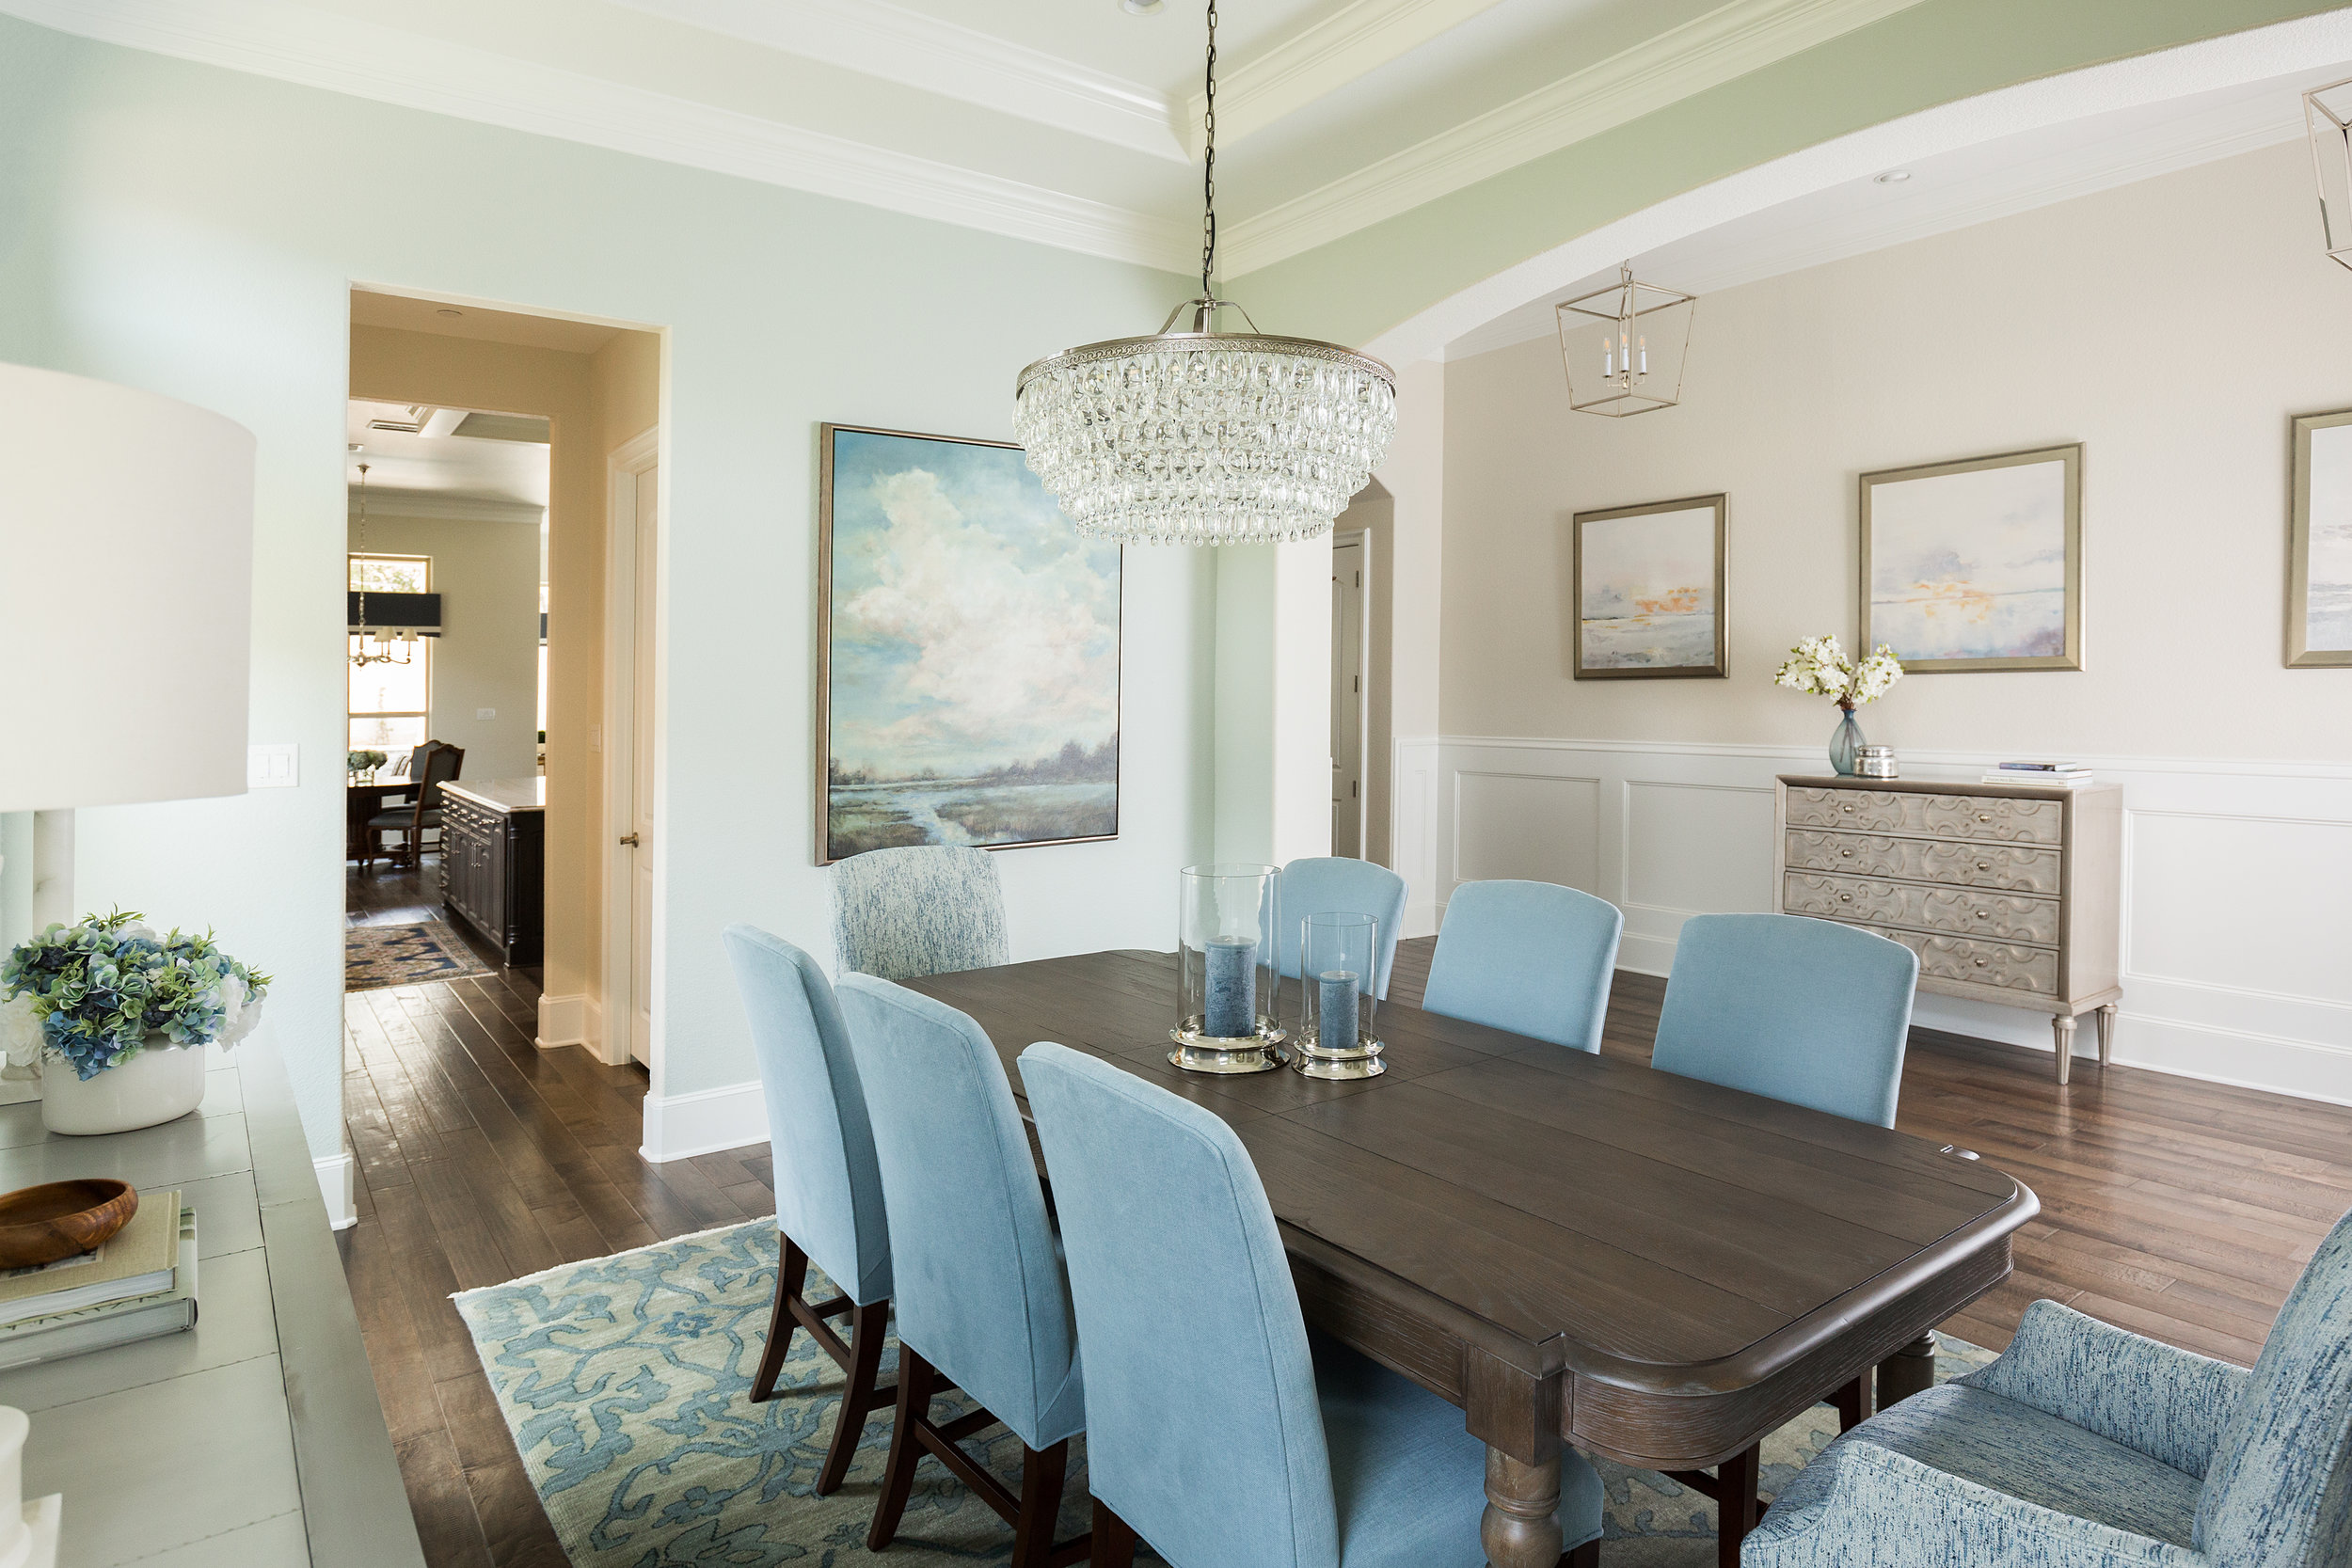 Room Reveal: Dining Room Design